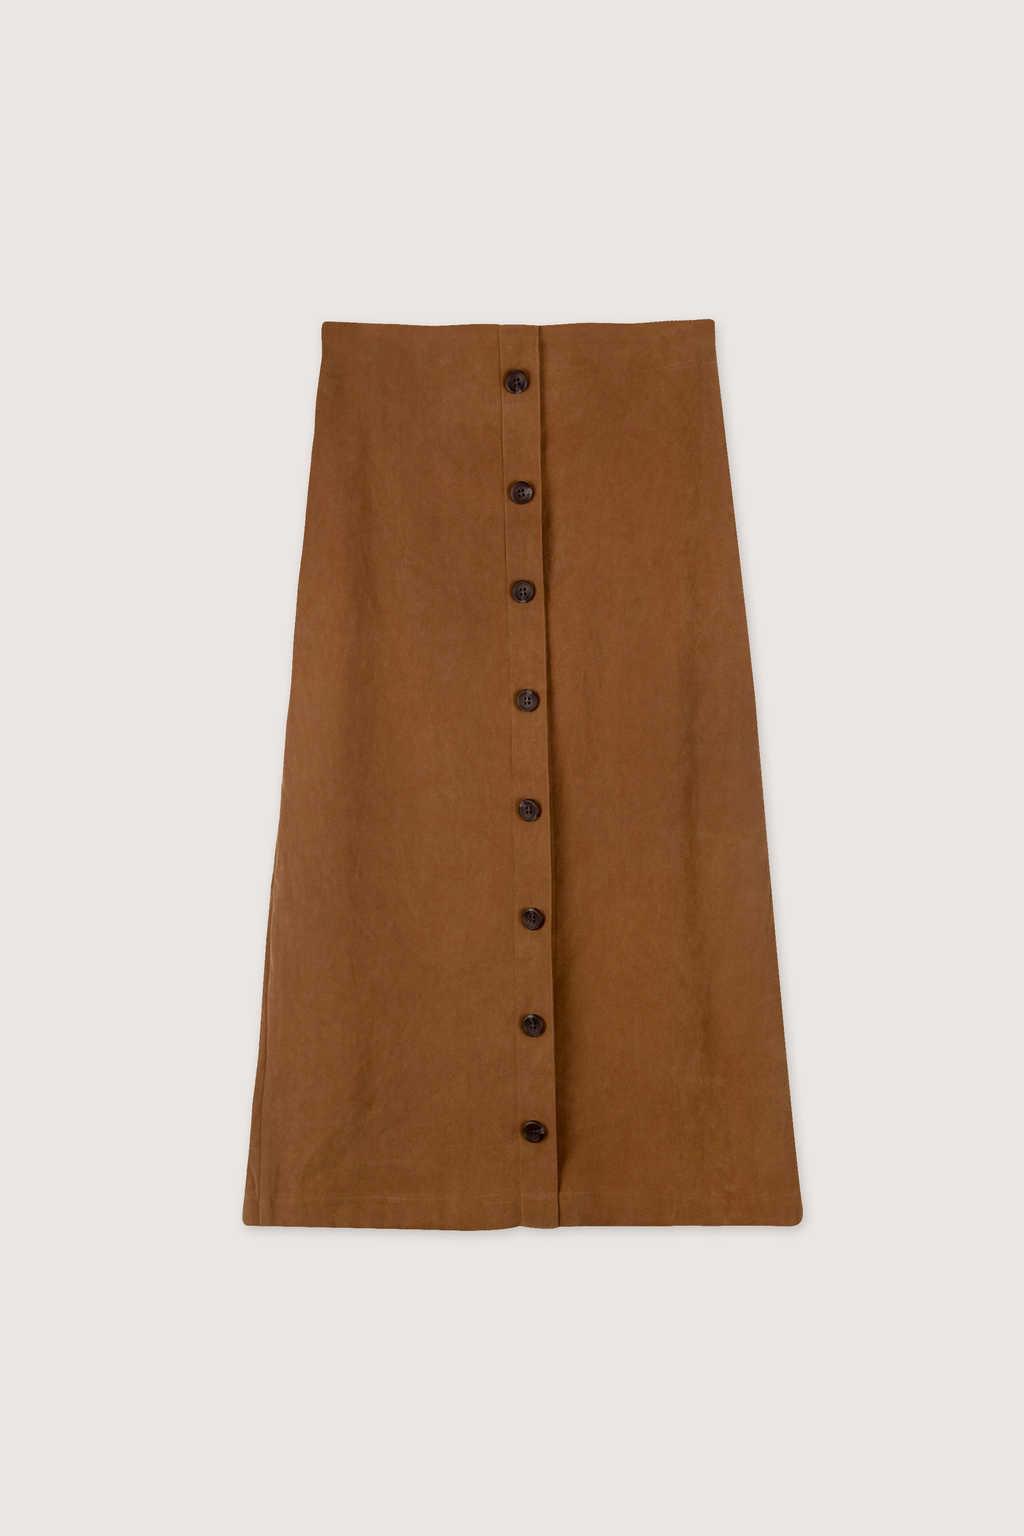 Skirt H112 Mustard 7